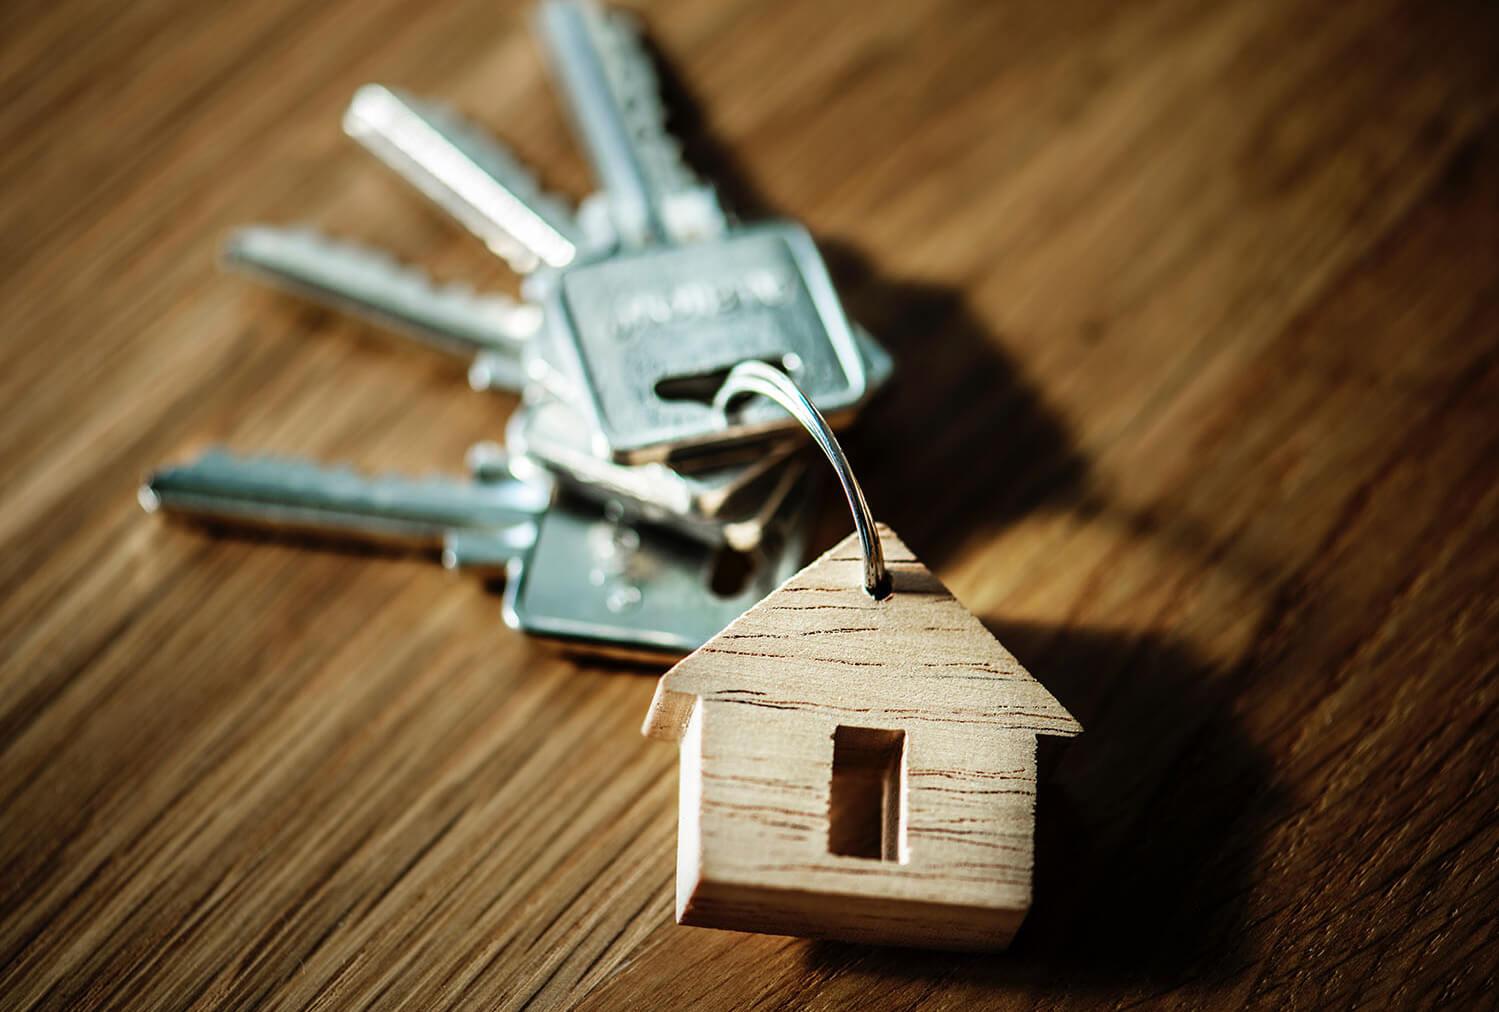 Home & Auto Insurance